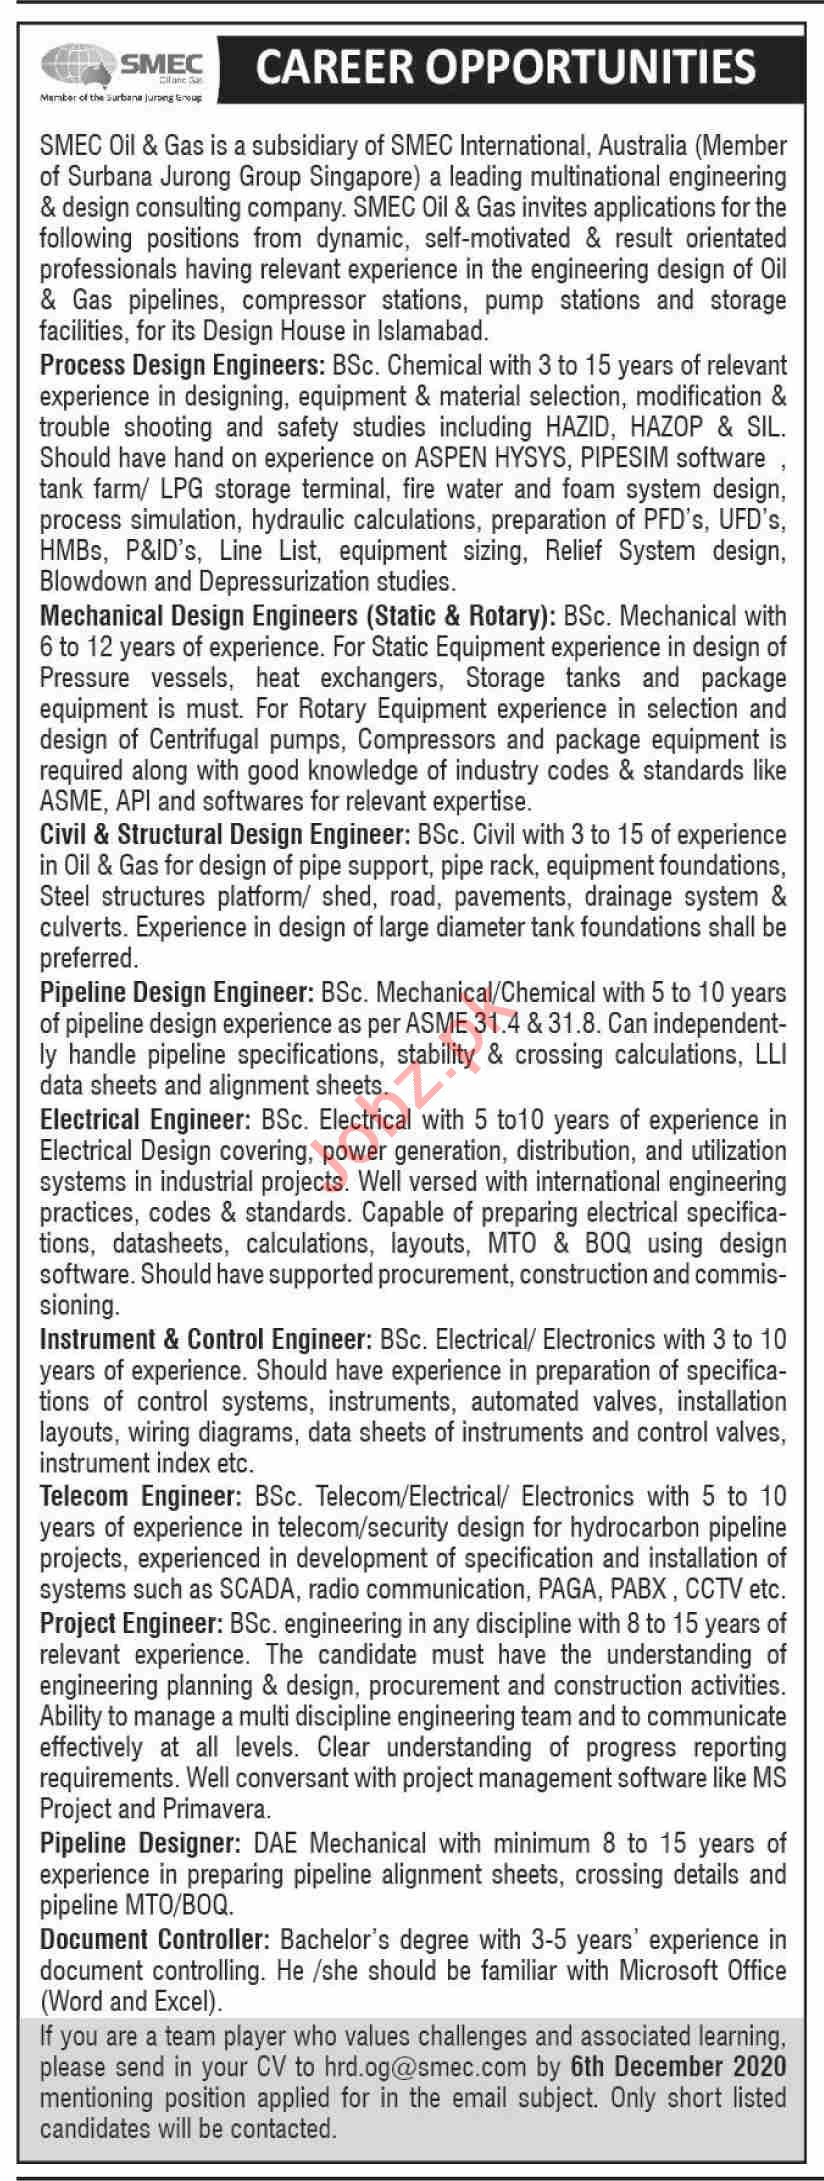 SMEC International Jobs 2020 for Process Design Engineer